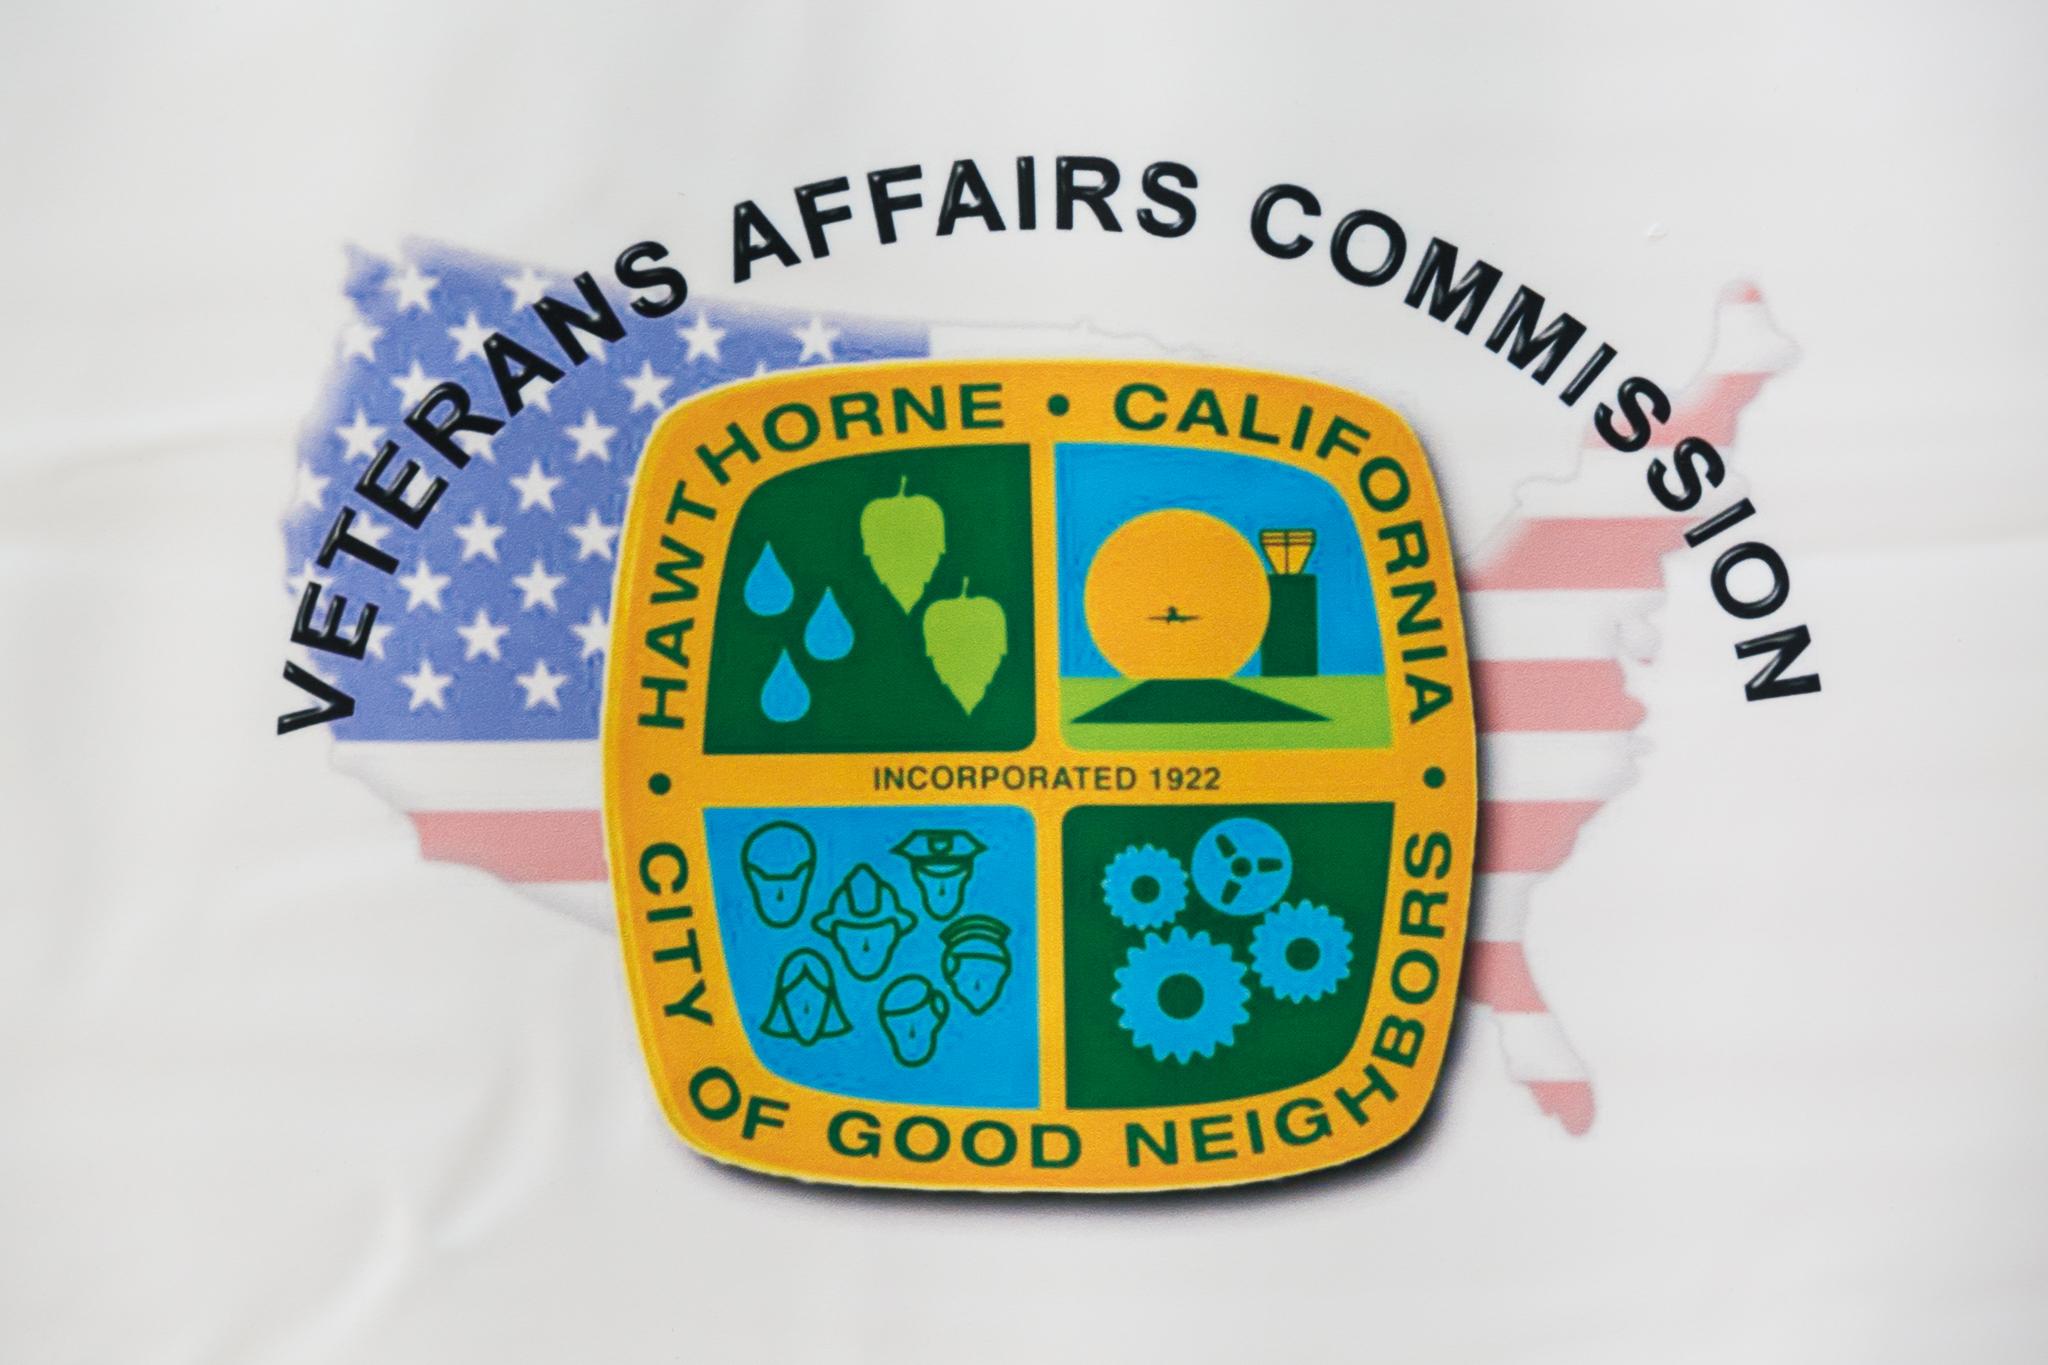 Veterans Affairs Commission logo